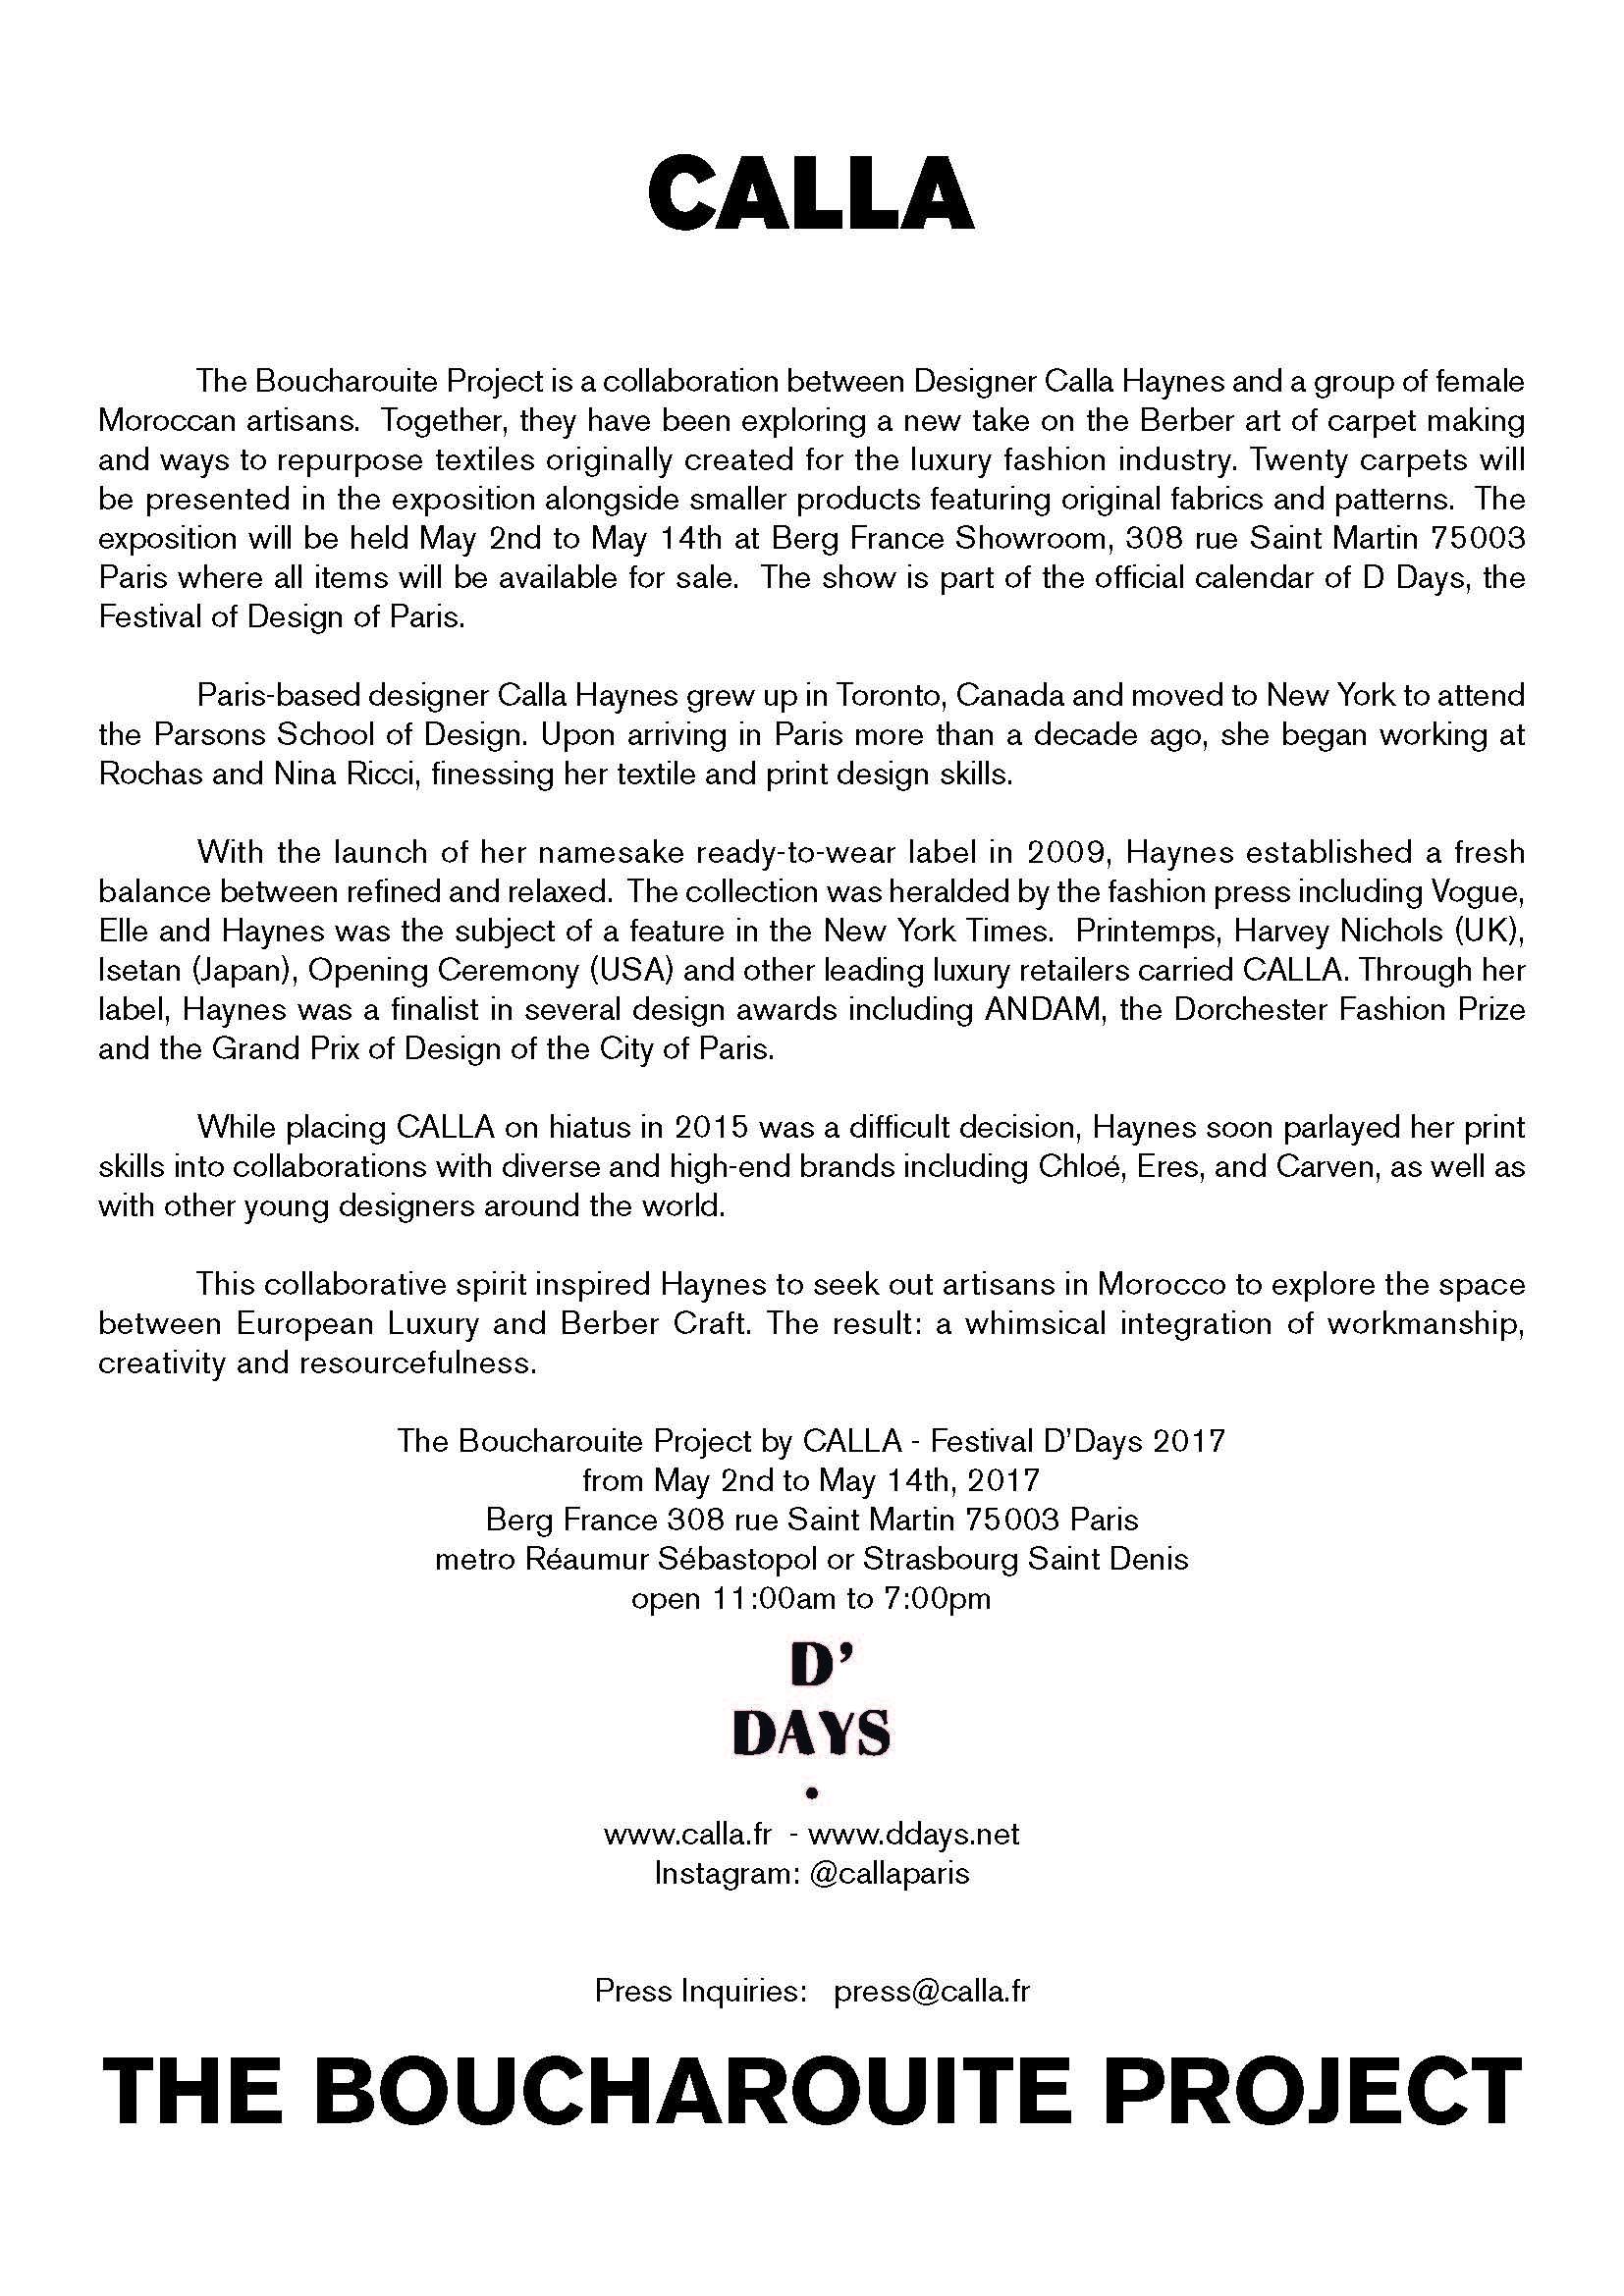 PRESS RELEASE PAGE 1.jpg